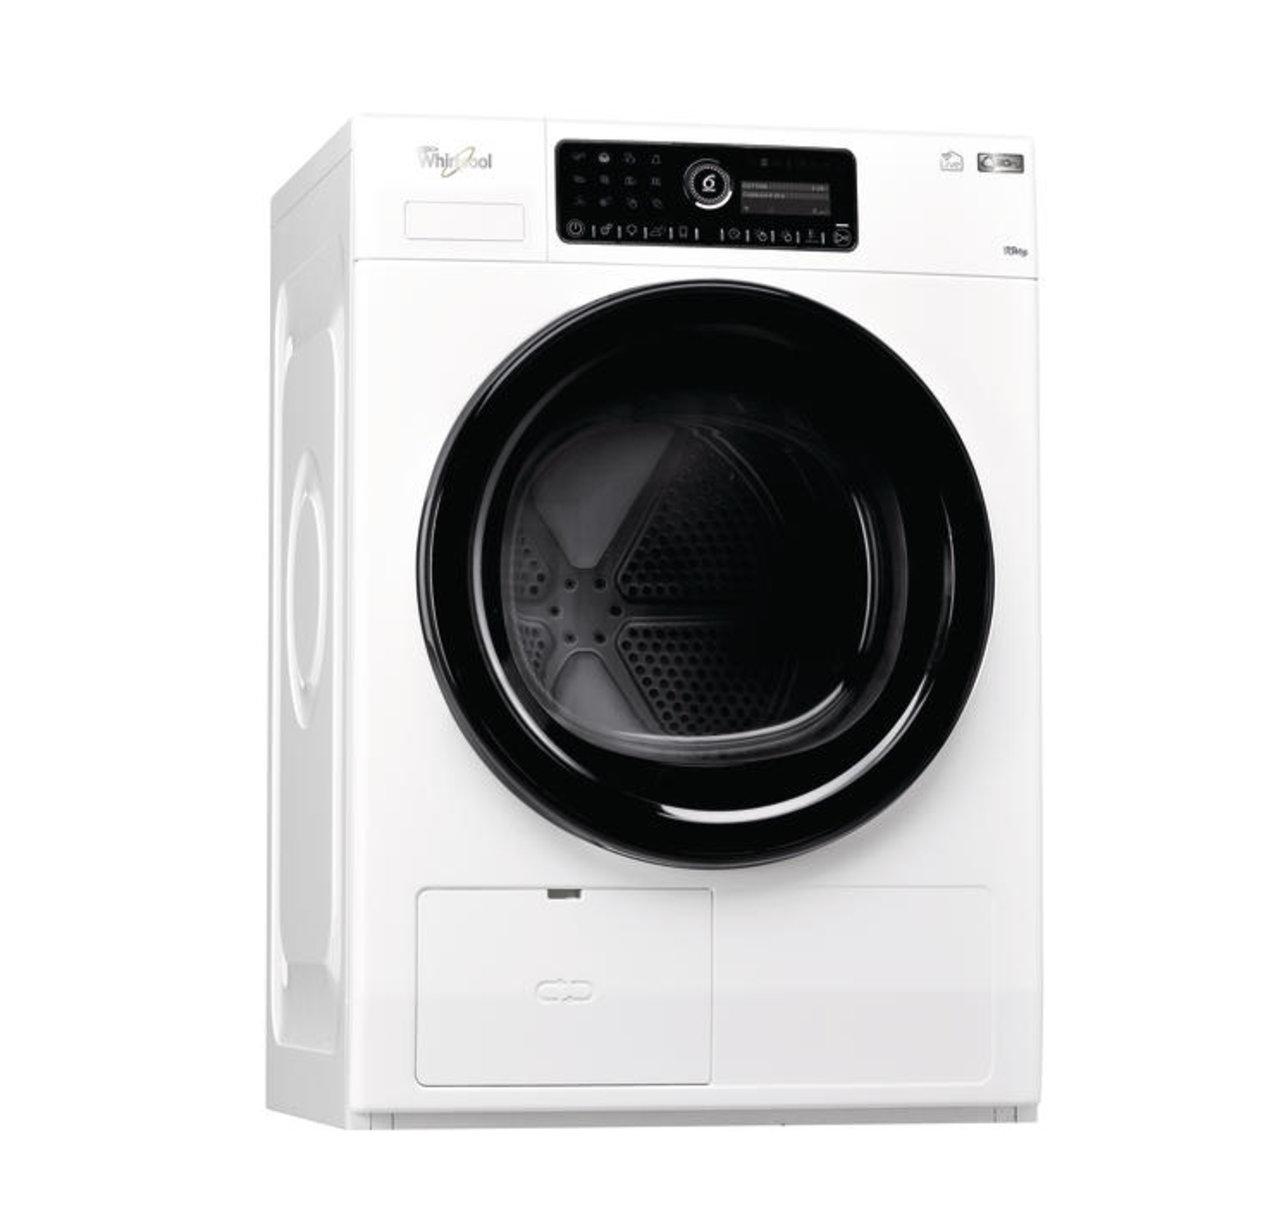 Whirlpool HSCX 10445 + doprava zdarma